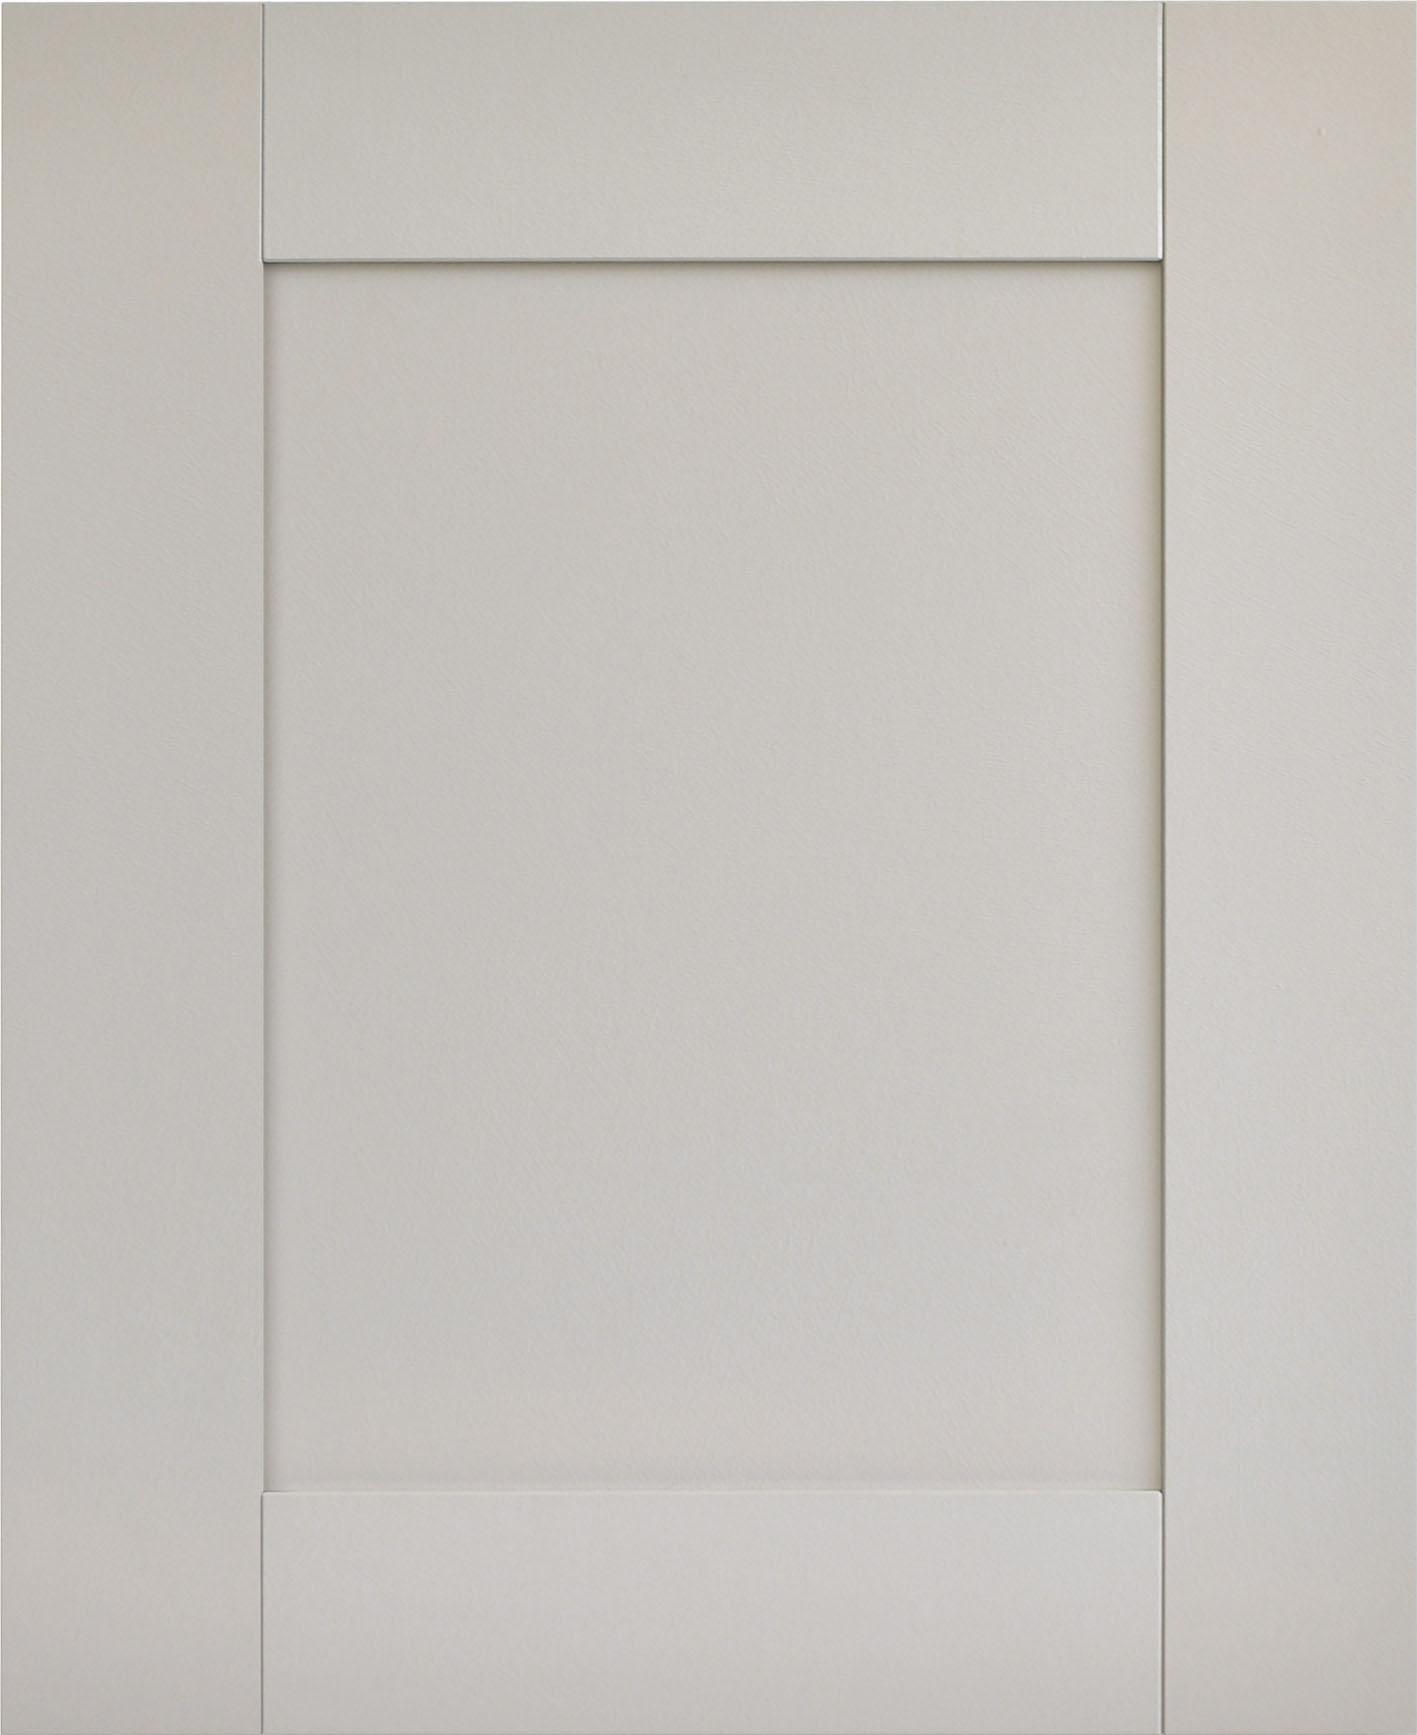 Square Frame 0144-SQ